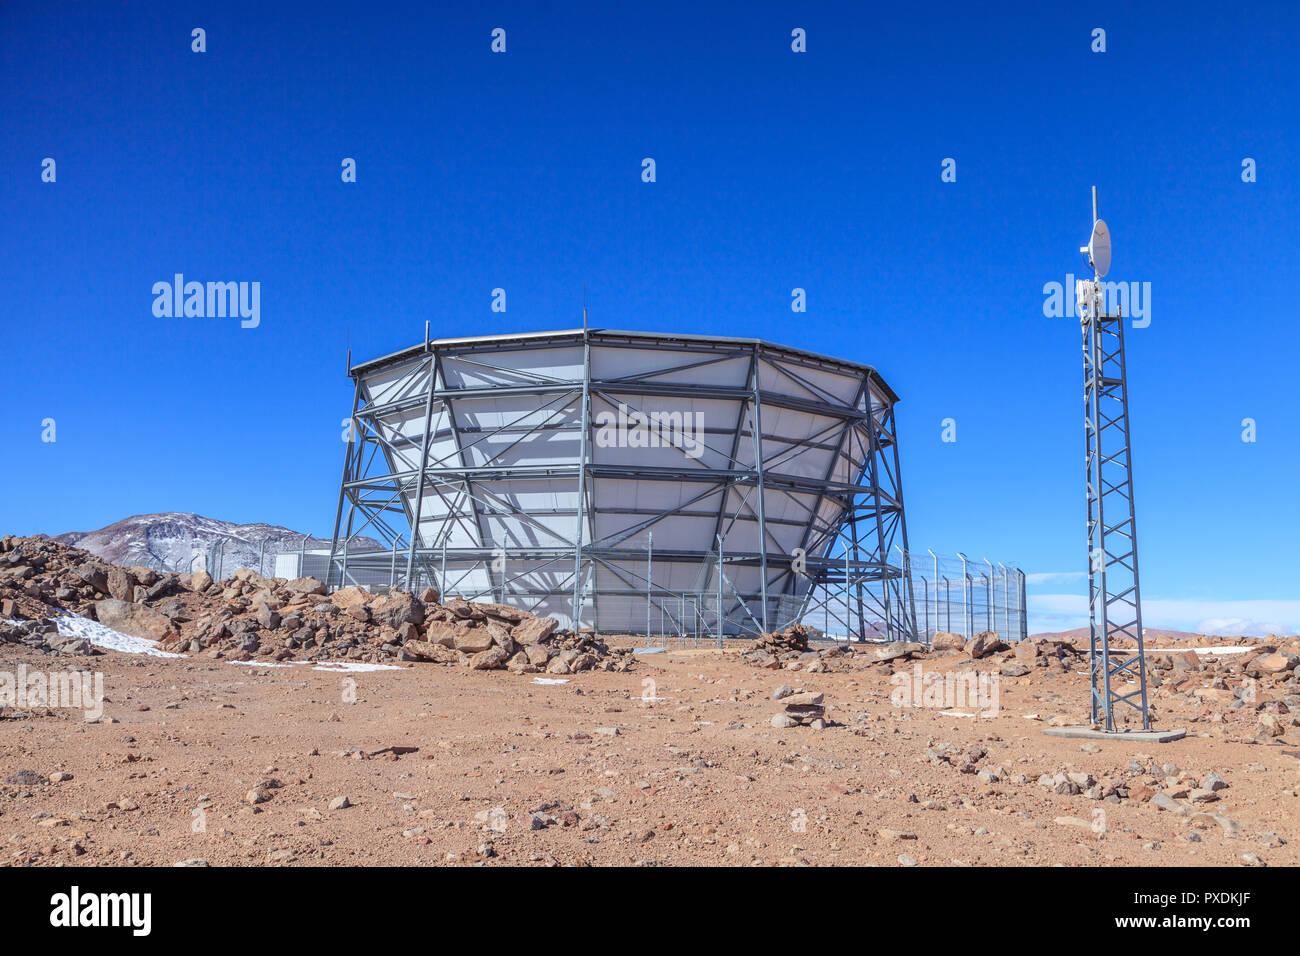 ATC radio-telescope at Cerro Toco - Stock Image